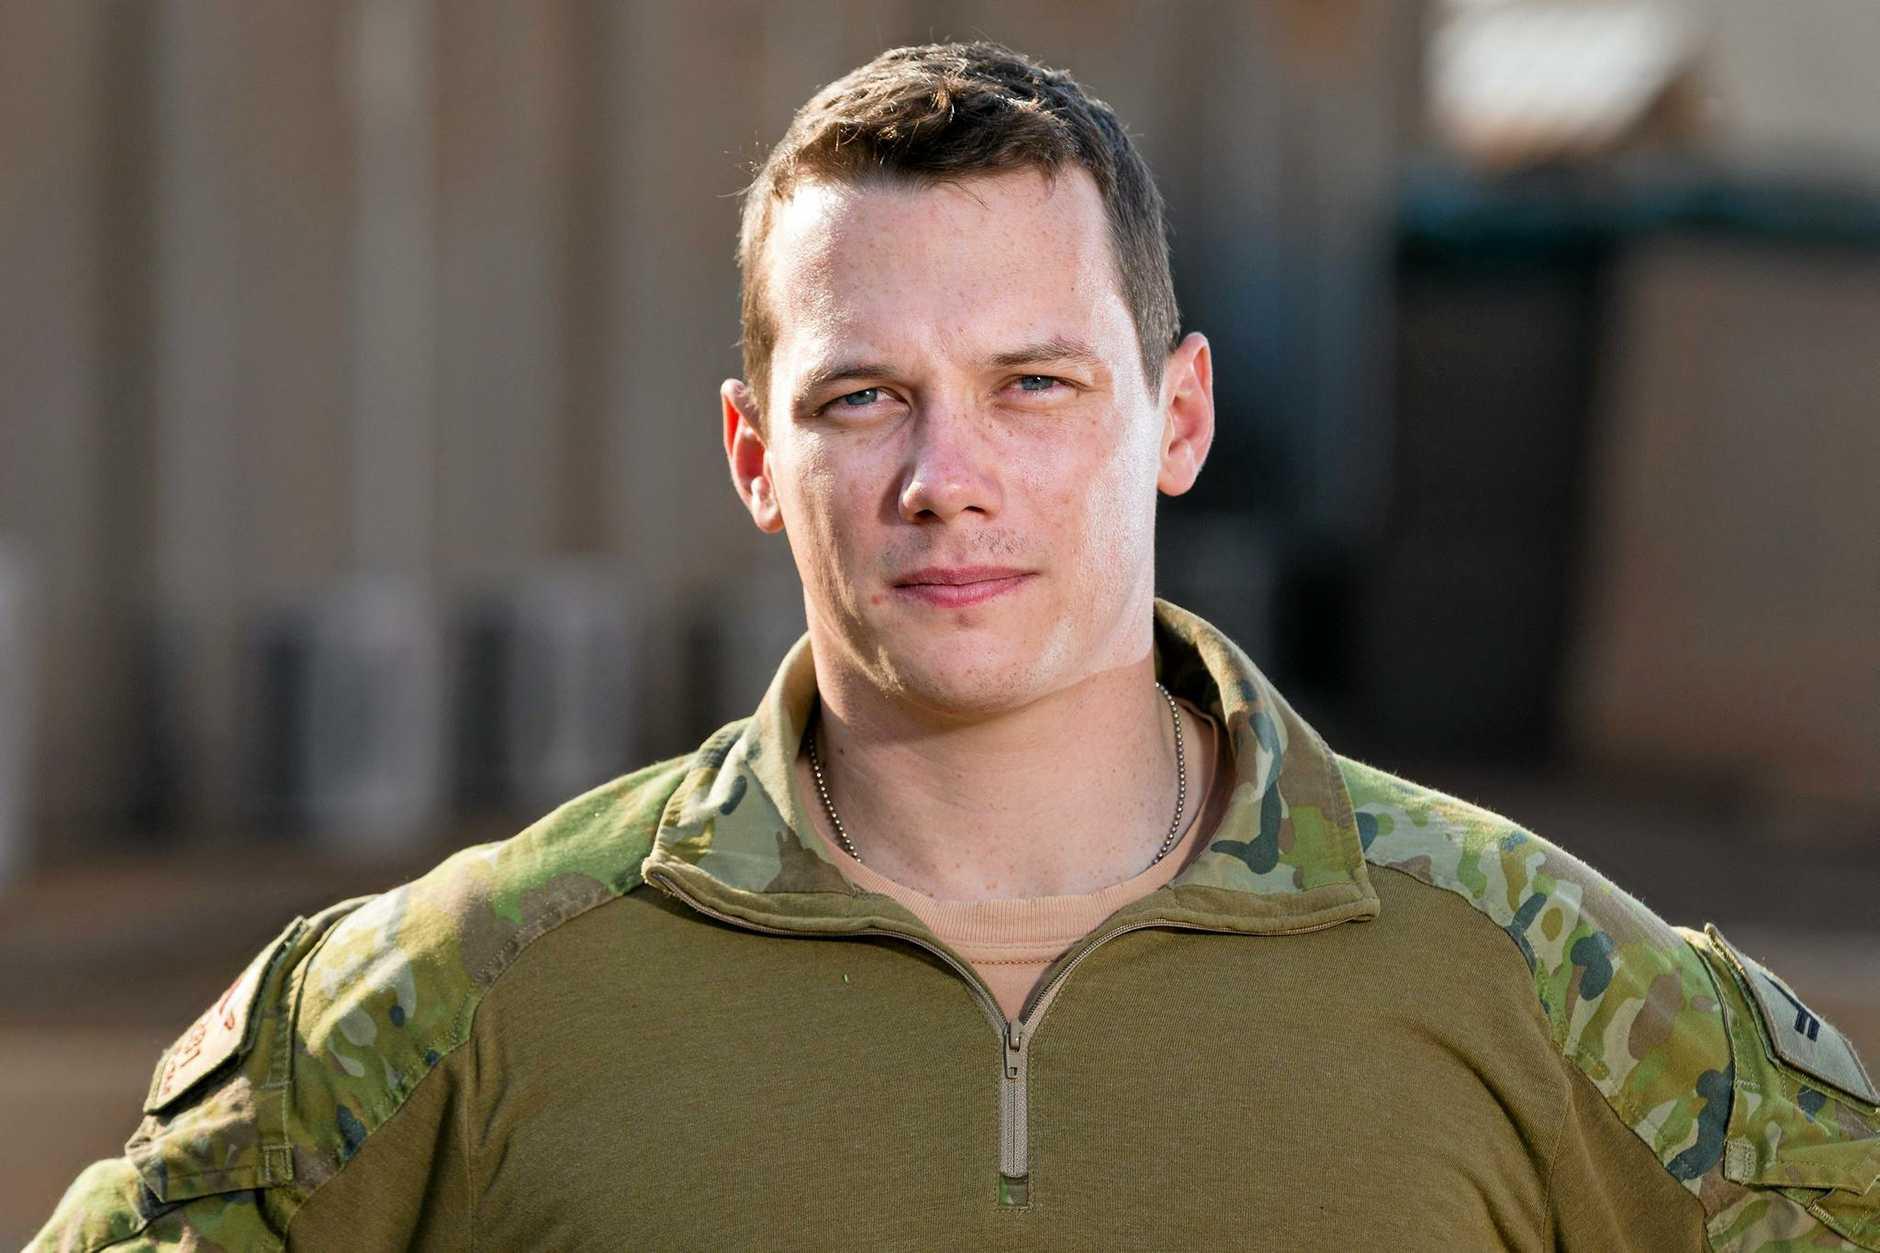 Australian Army soldier Corporal Elio Scarpelli Task Goup Taji 4 at Taji Military Complex, Iraq.